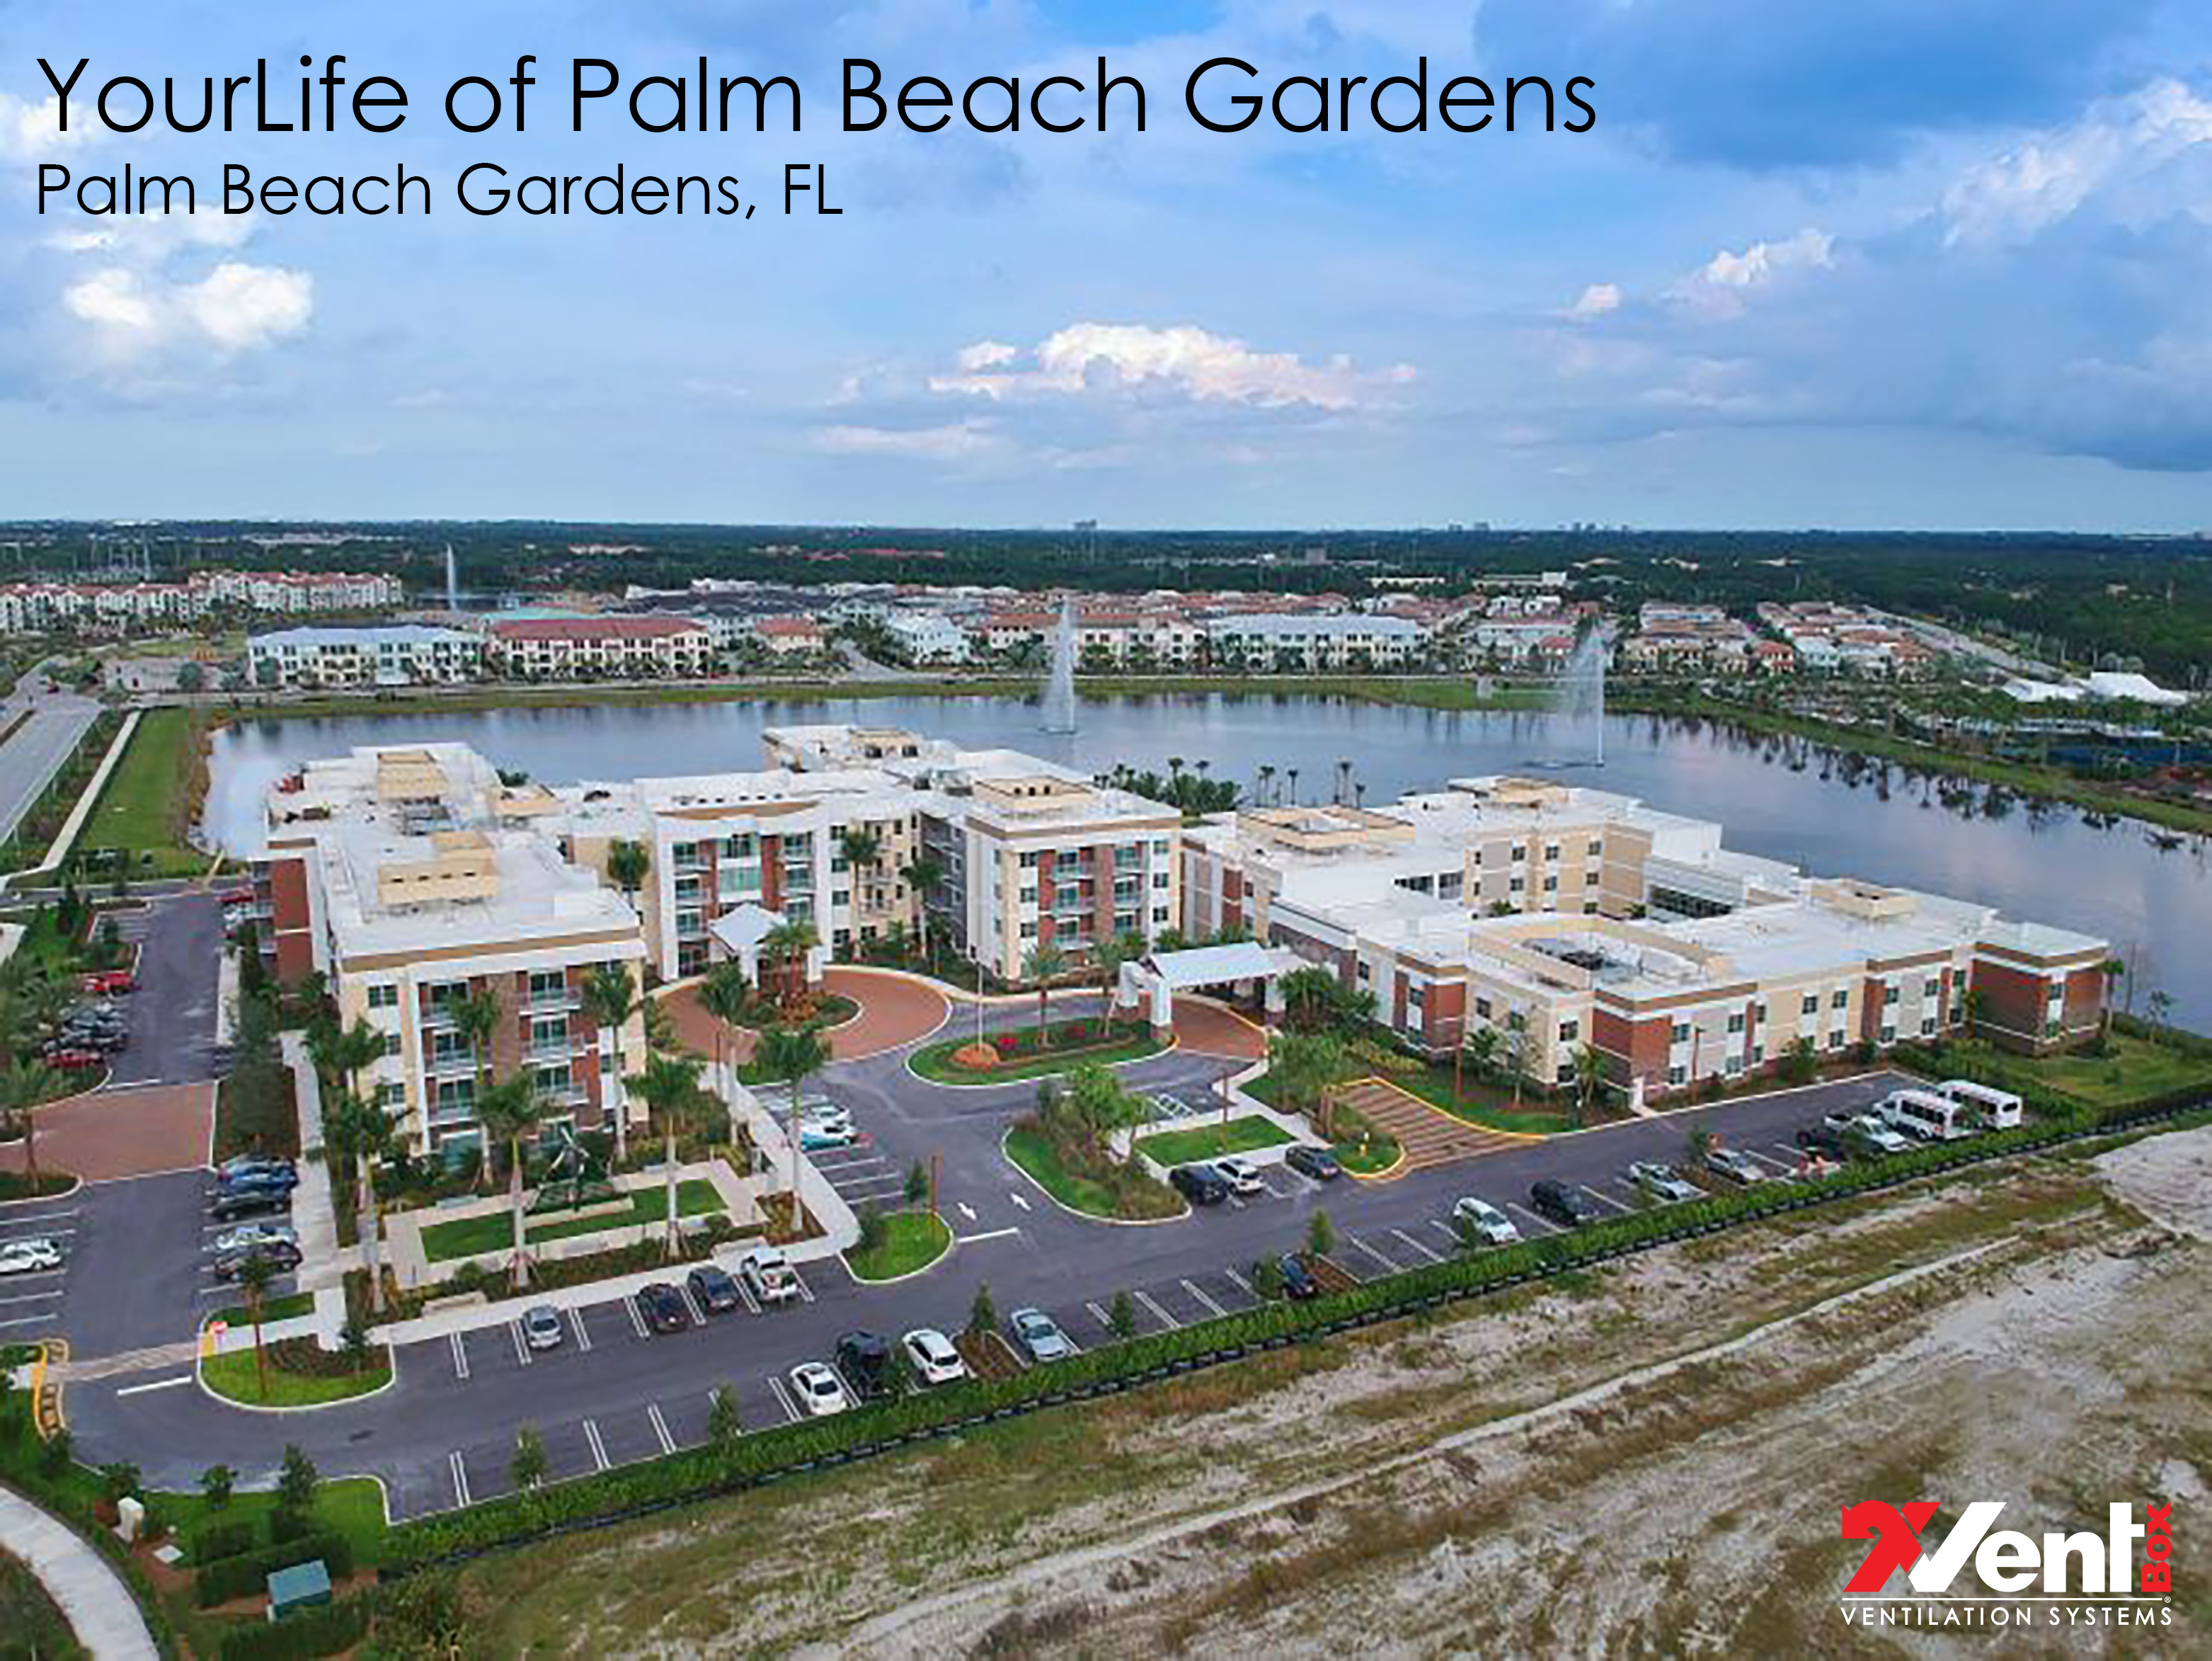 YourLife of Palm Beach Gardens